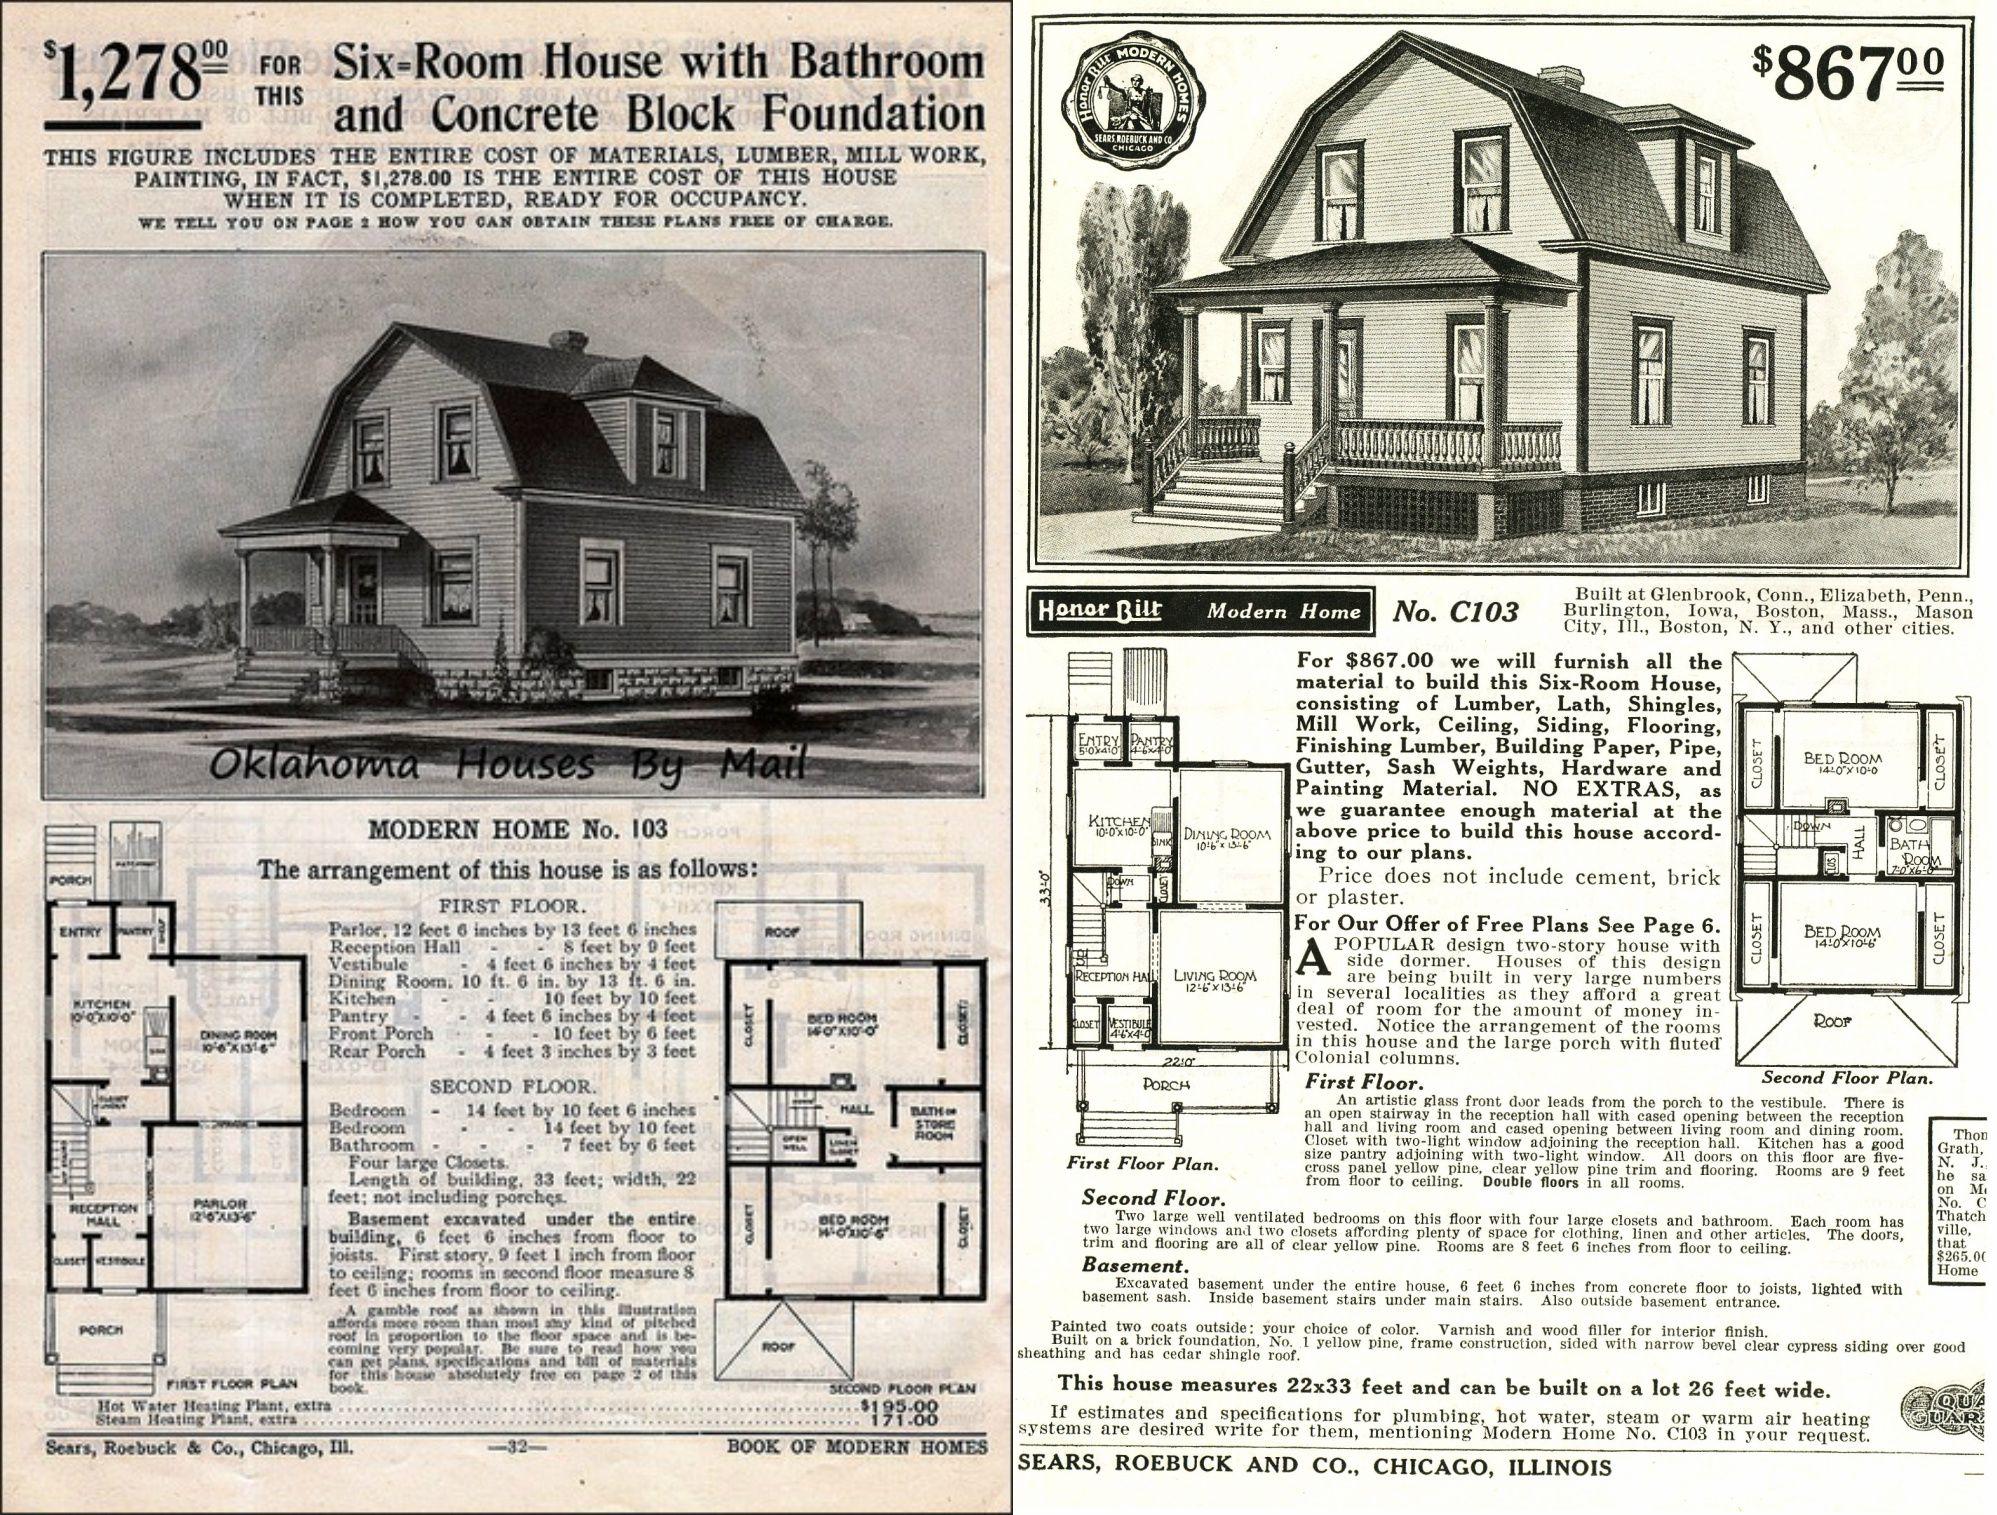 Sears Lucerne 1908 103 1909 1911 103 1912 103 1913 103 1914 1915 1916 264p103 1917 C103 1918 C103 Gambrel Roof Concrete Block Foundation Gambrel